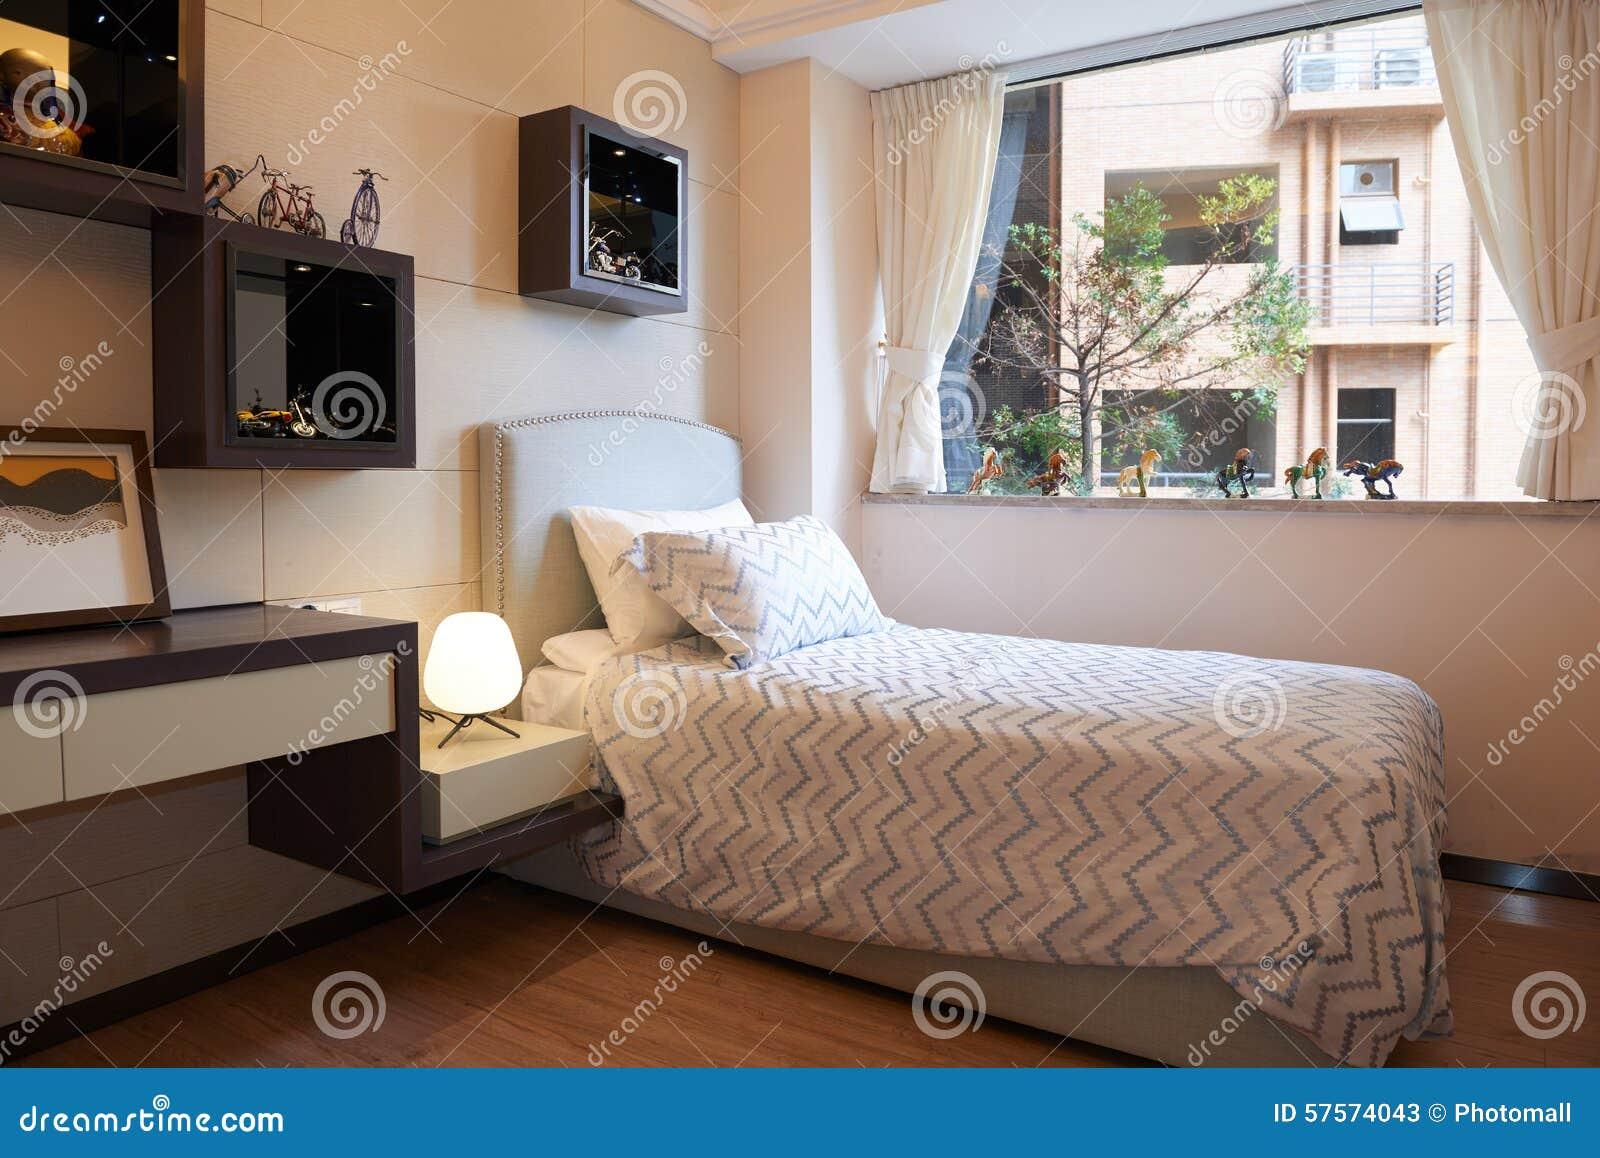 petite chambre coucher moderne photos stock - Chambre A Couche Petite